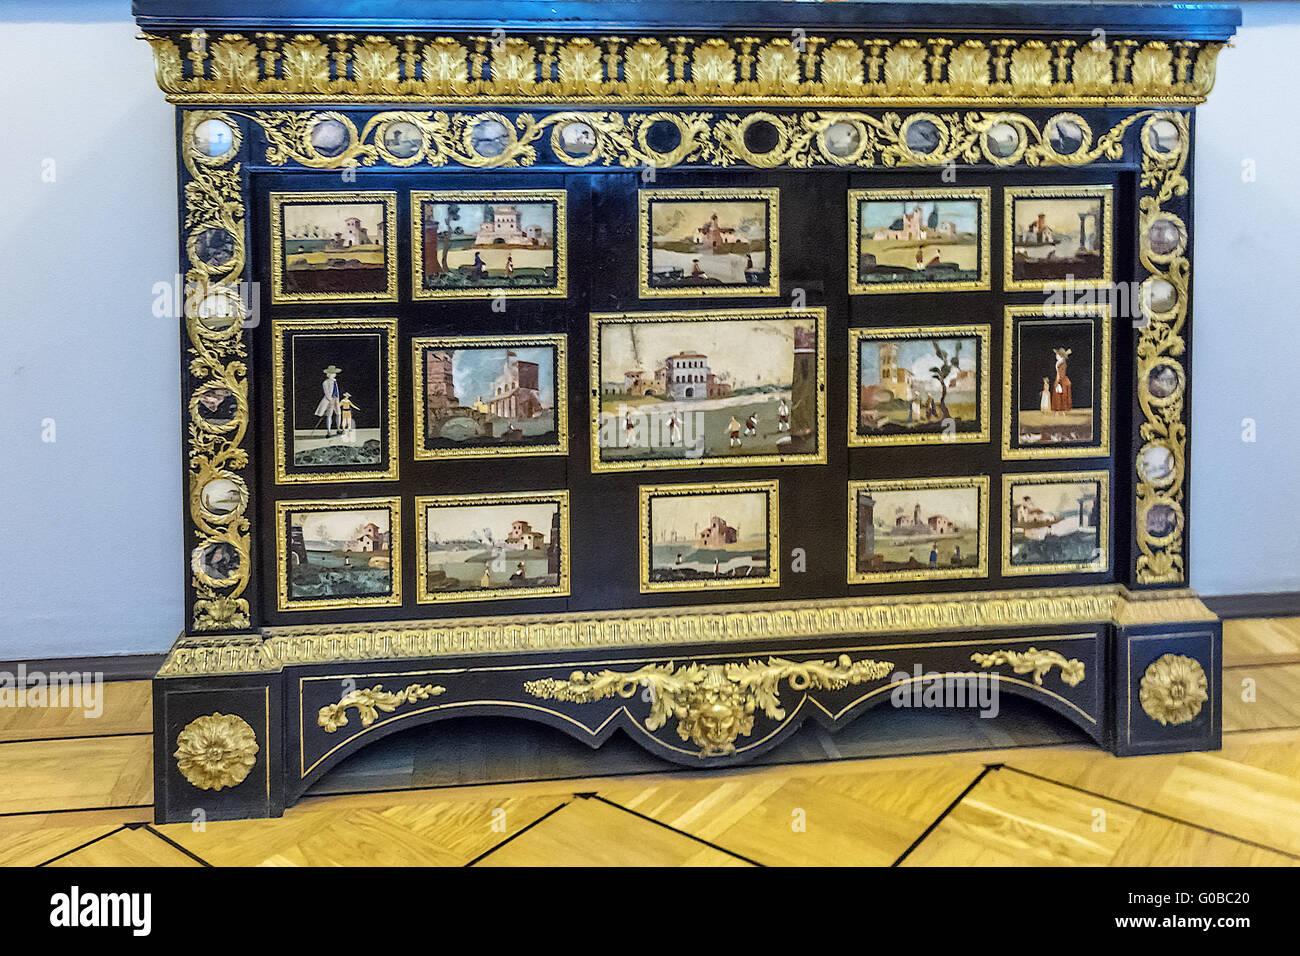 Ornate Cabinet Winter Palace St. Petersberg Russia - Stock Image